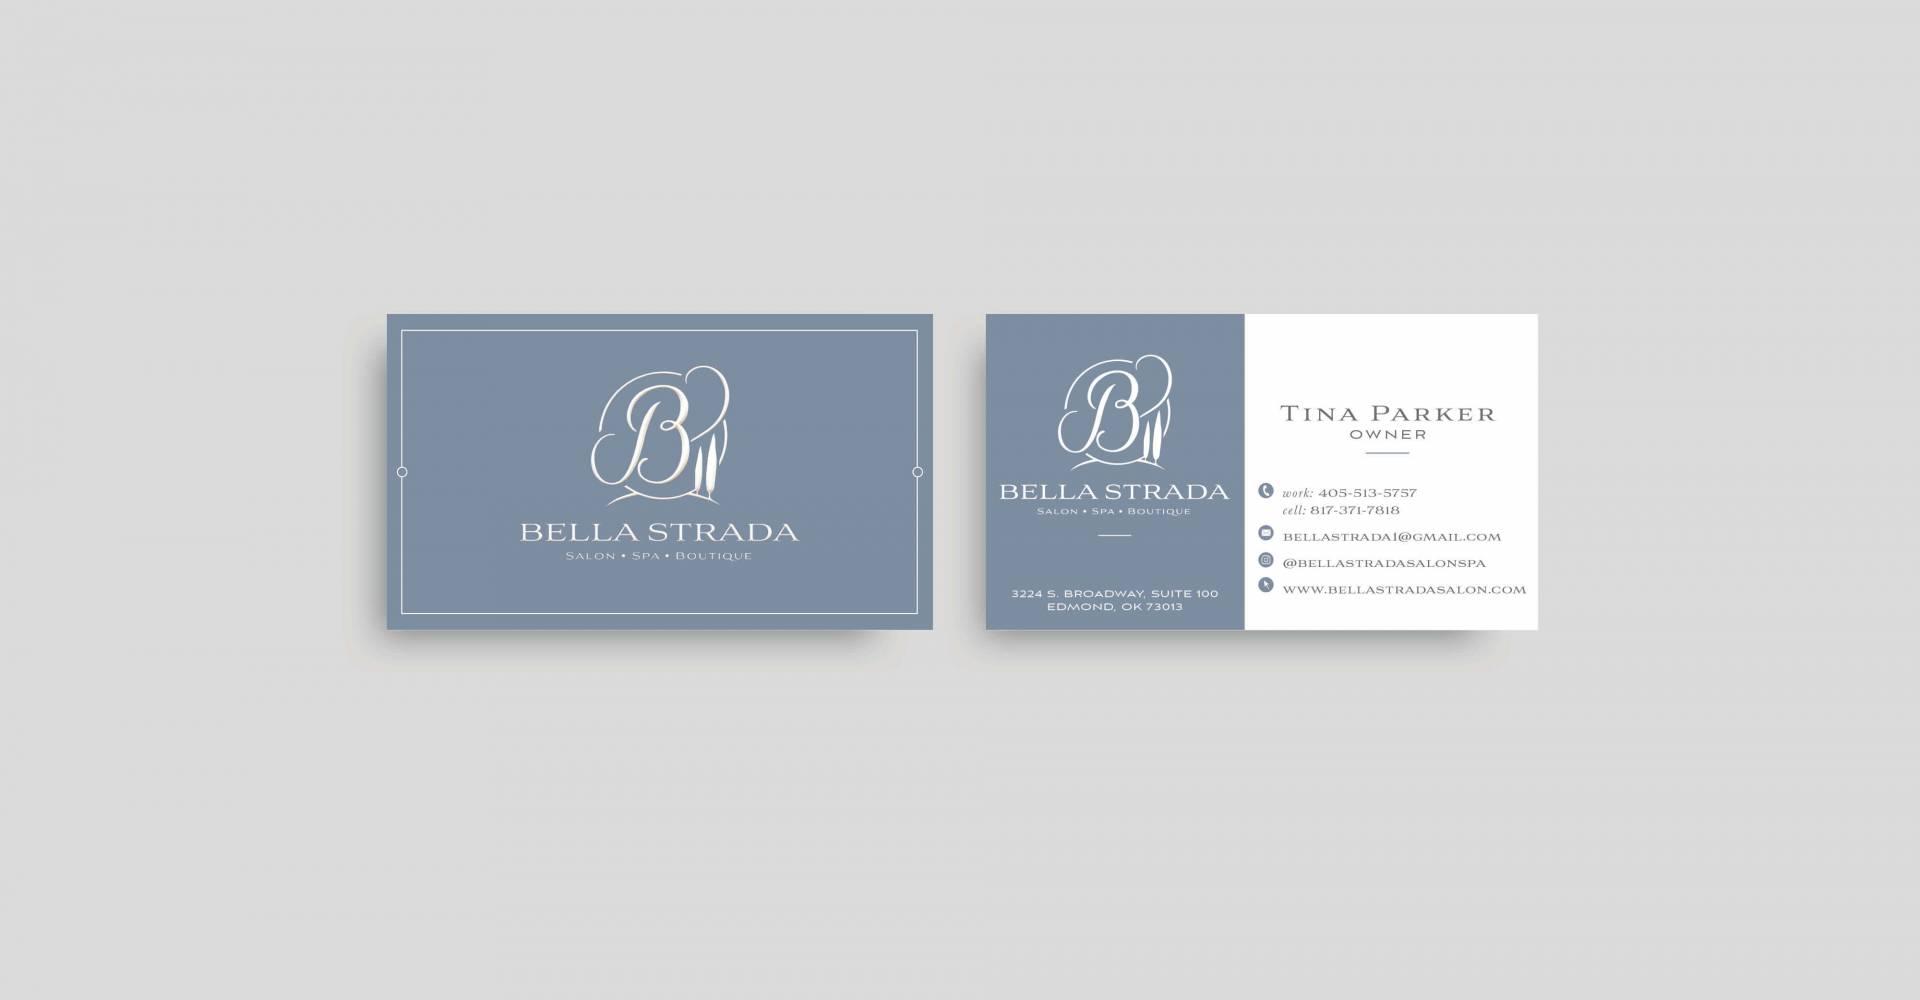 Bella Strada Salon & Spa Business Cards